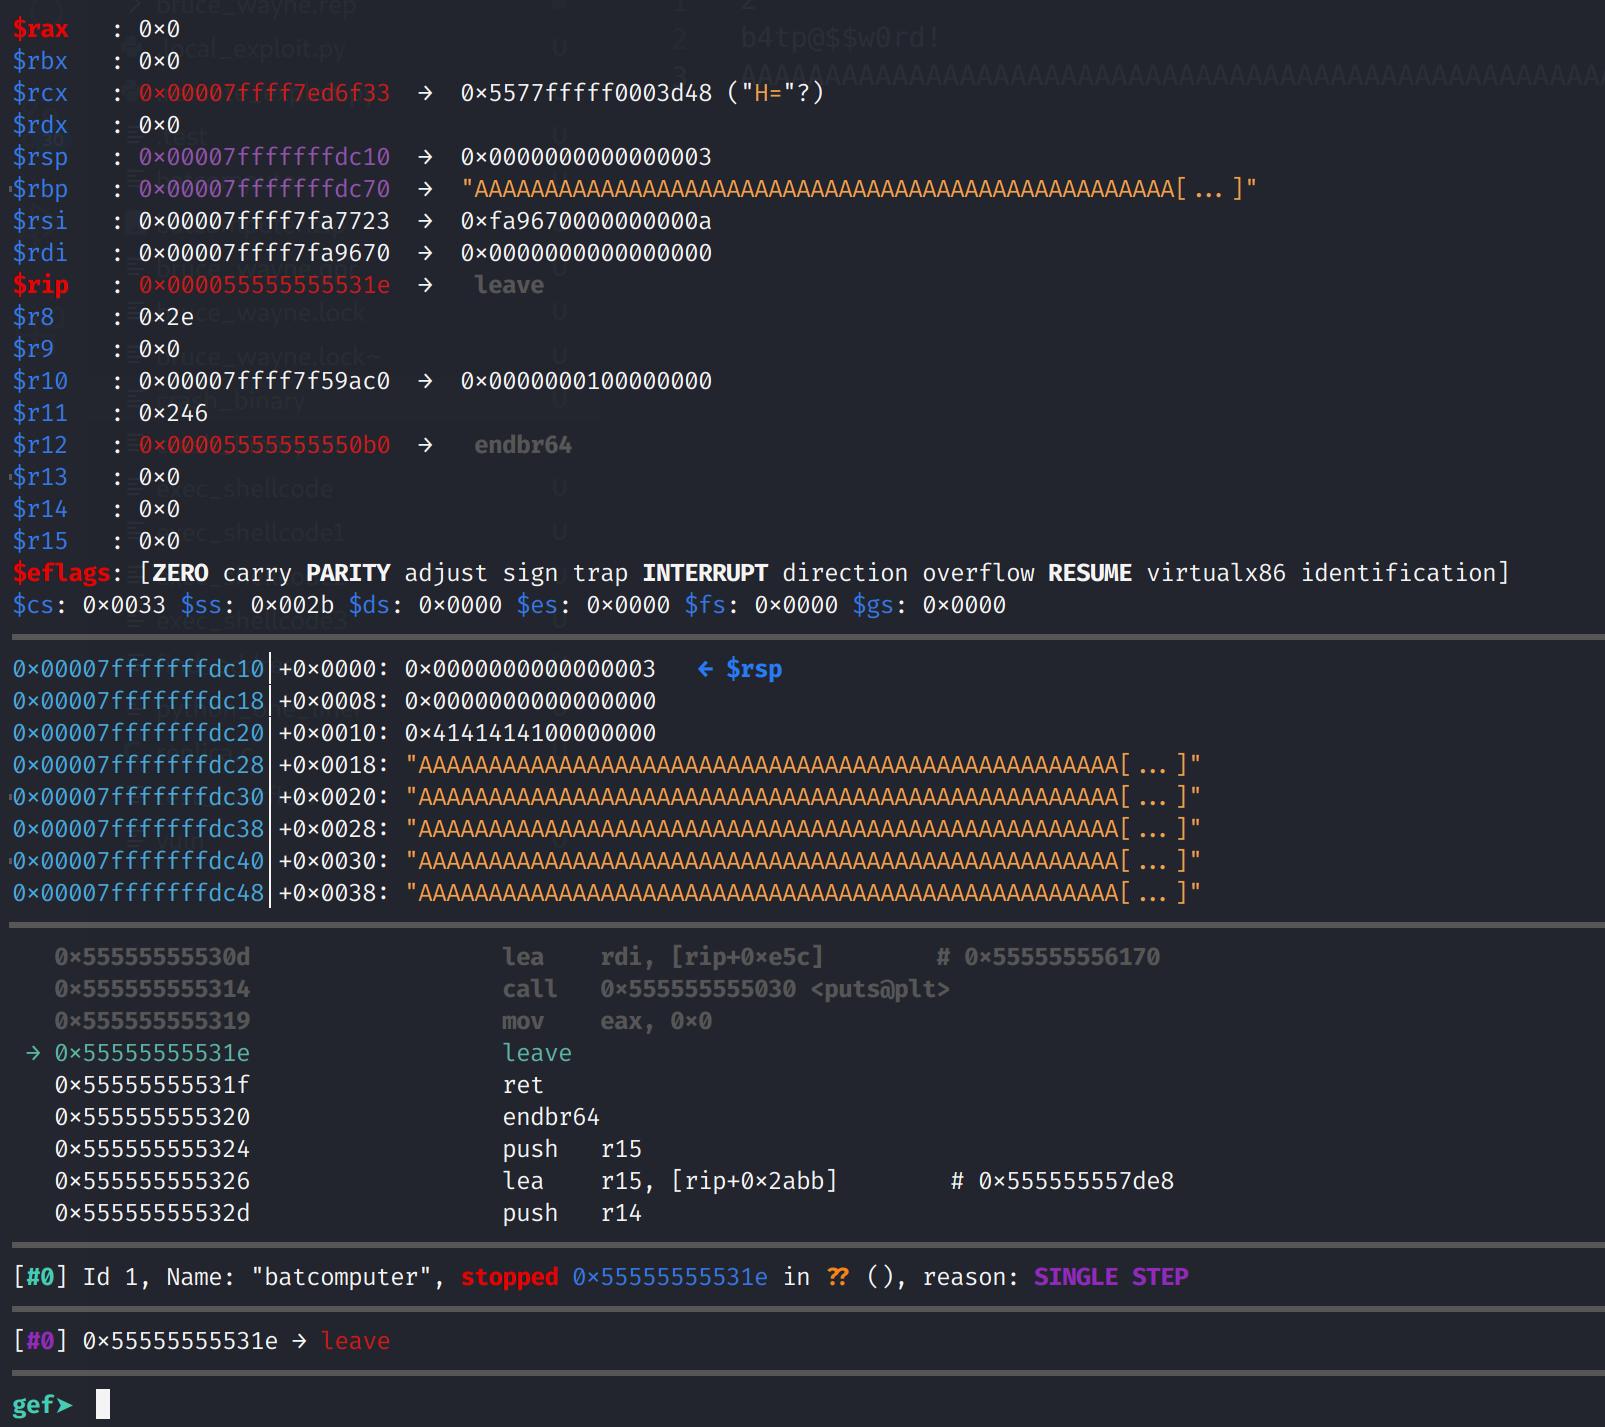 Crashing the binary in gdb